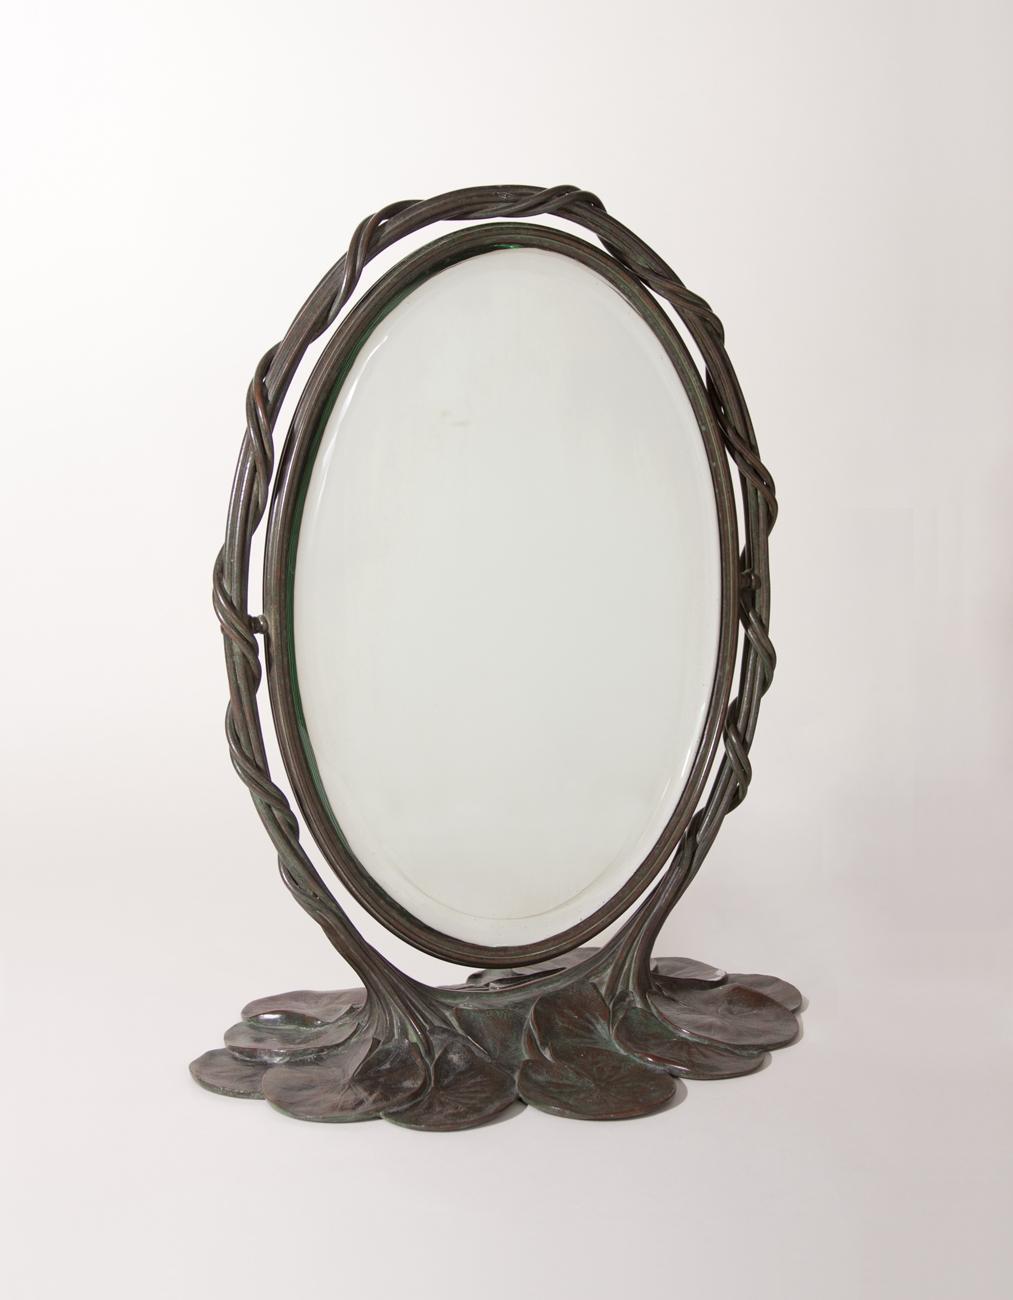 Tiffany Studios Lily Pad Mirror 1